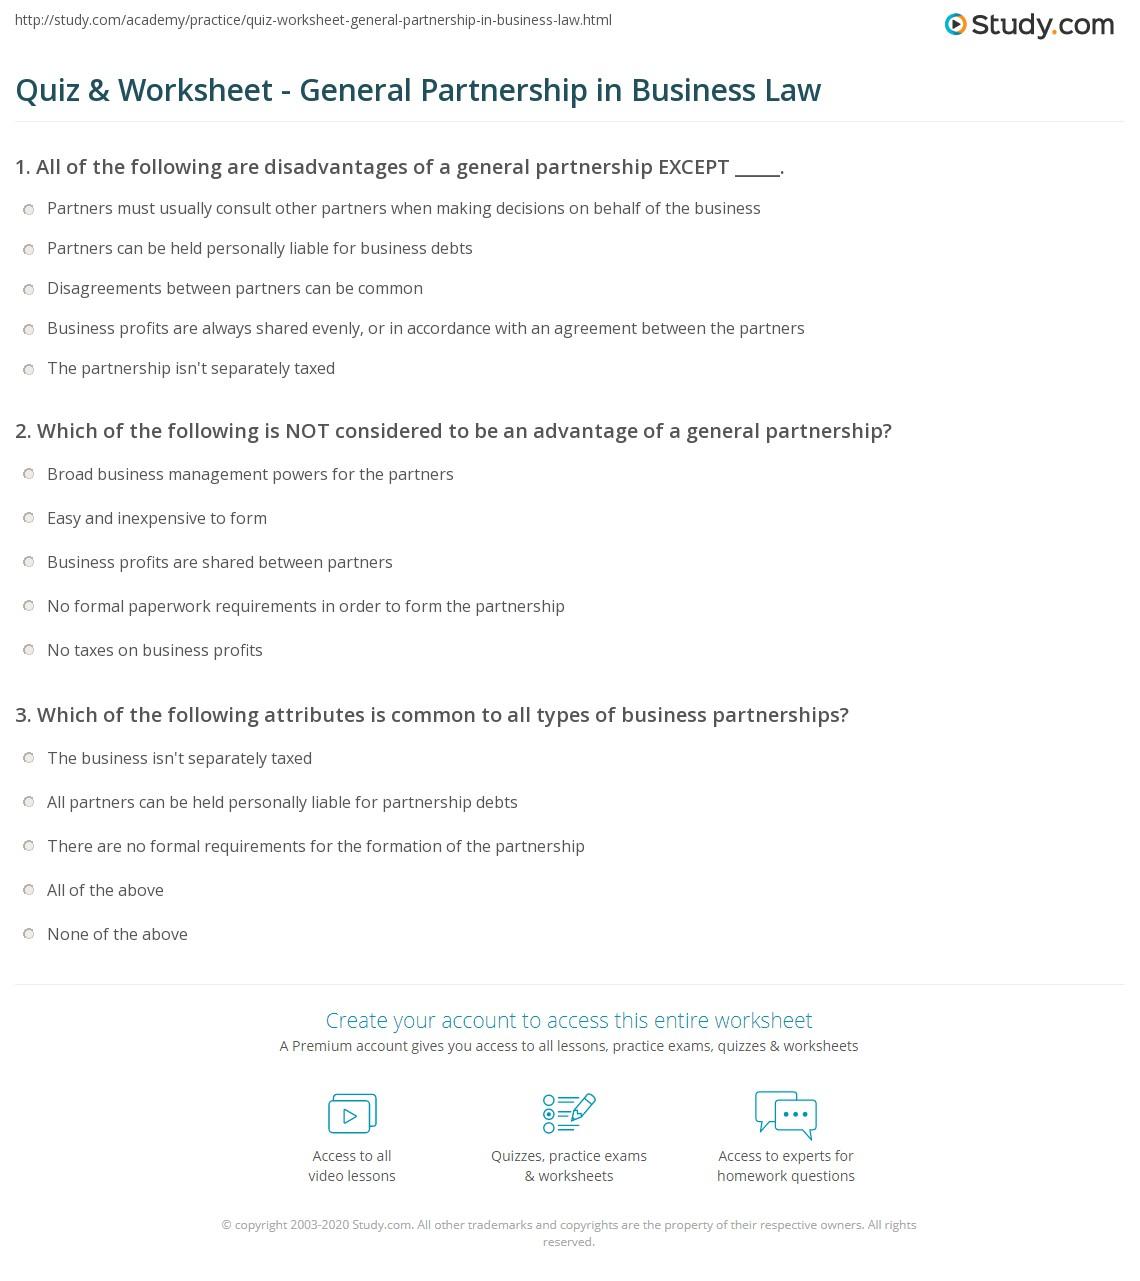 quiz & worksheet - general partnership in business law | study